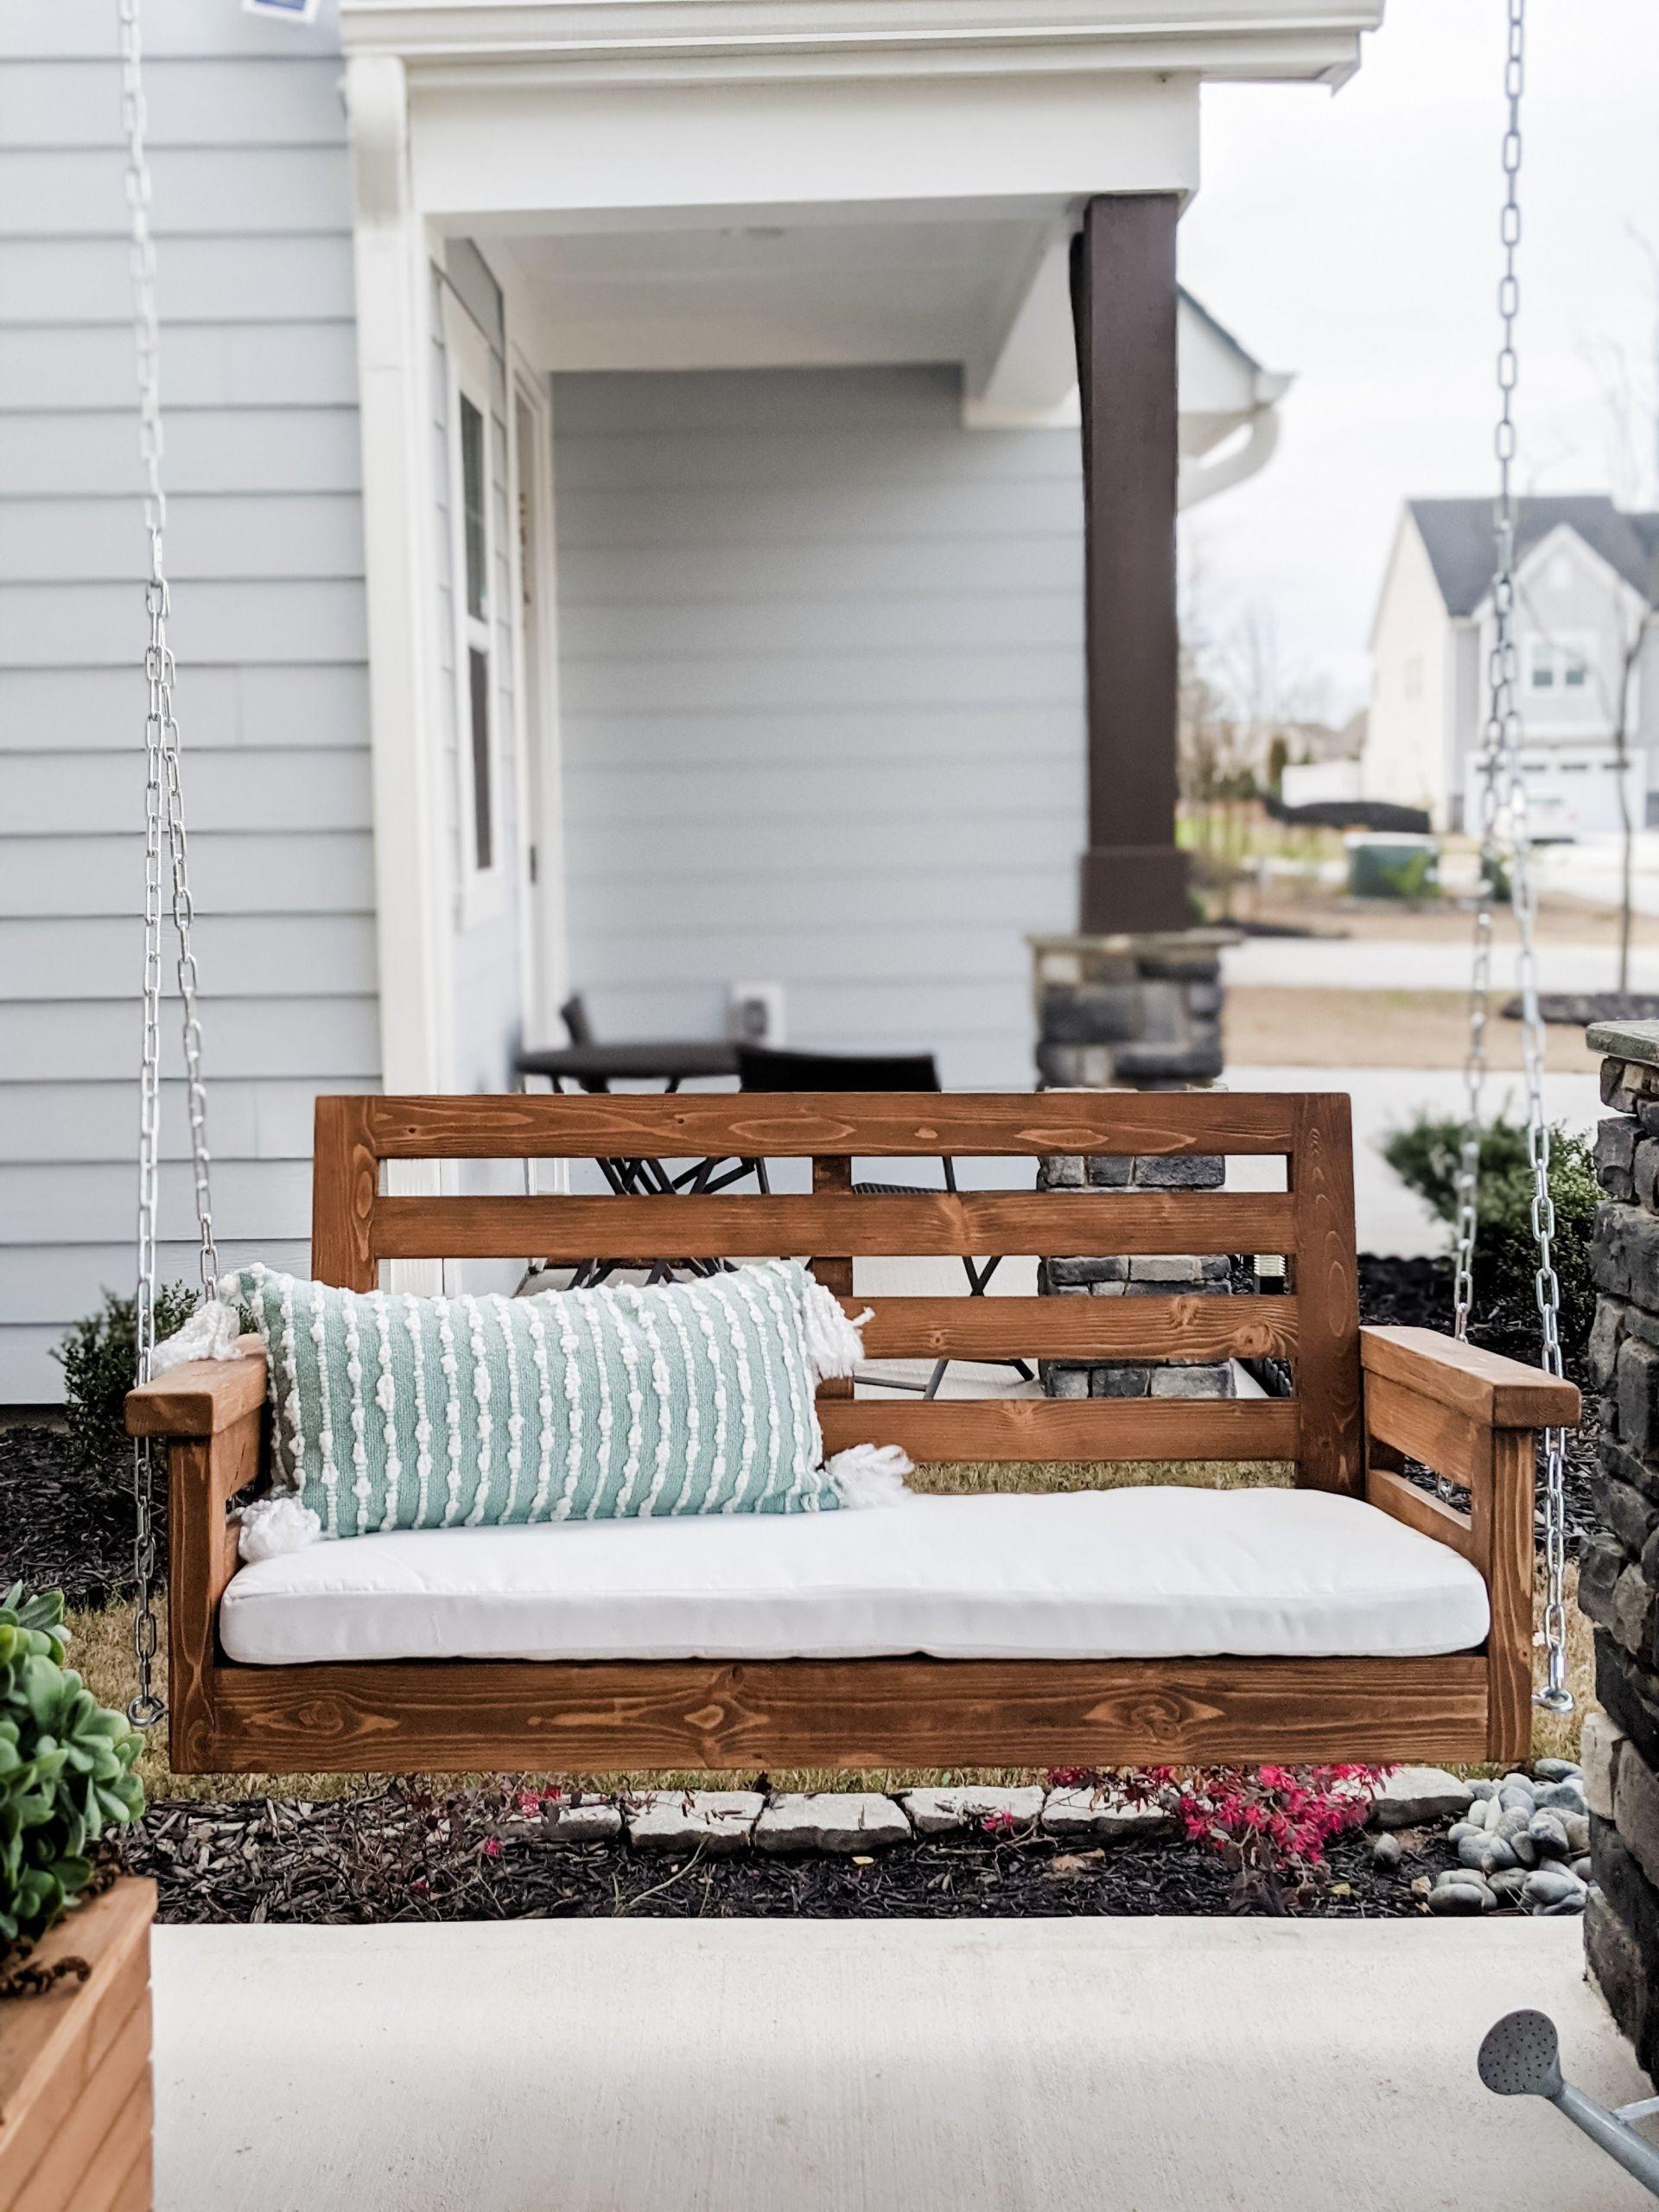 DIY Porch Swing Plans  DIY Porch Swing Plans